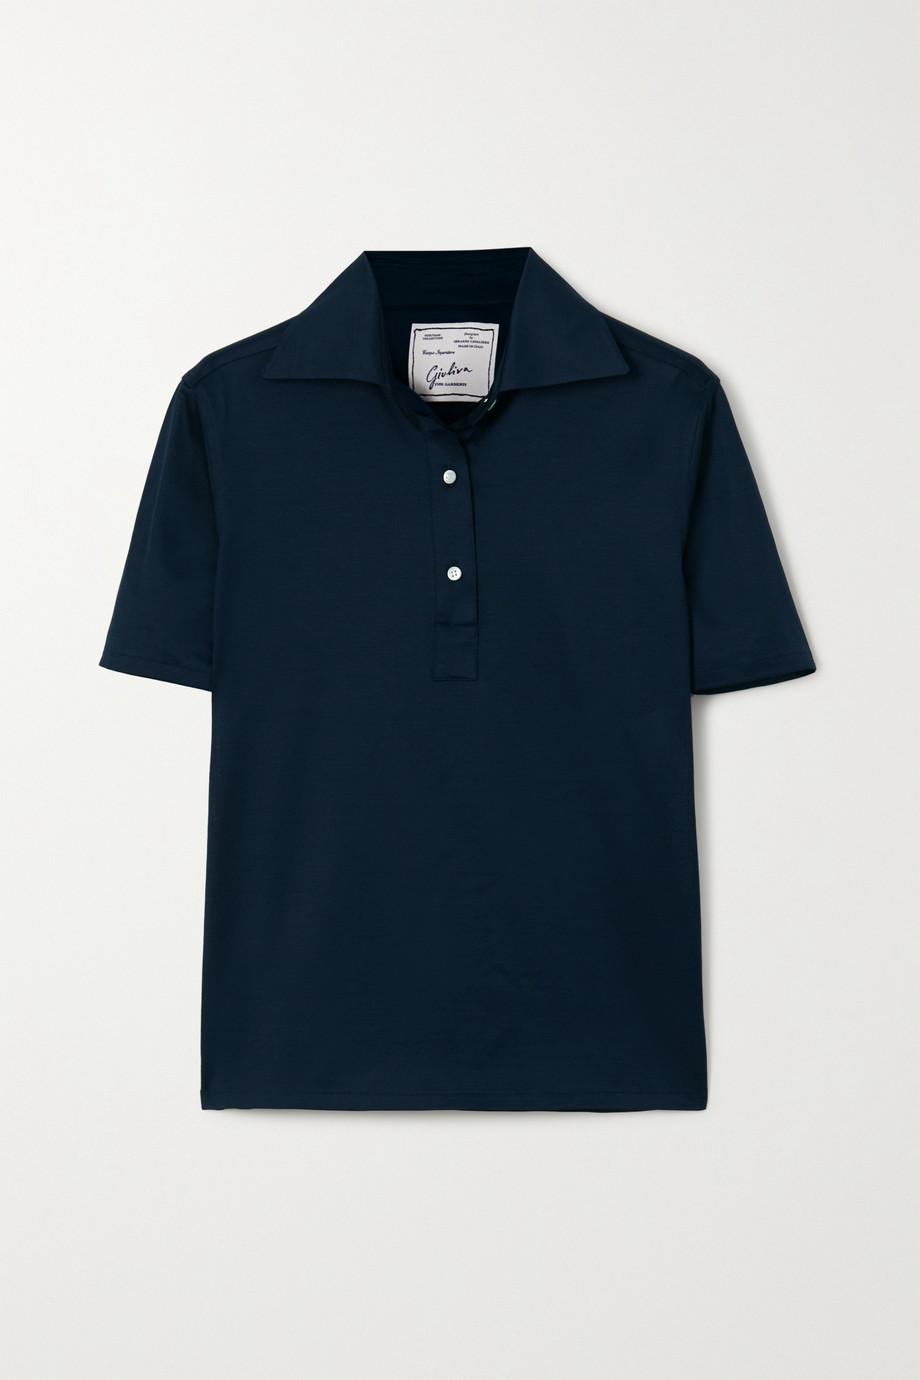 Giuliva Heritage Daphne Polohemd aus Baumwoll-Piqué